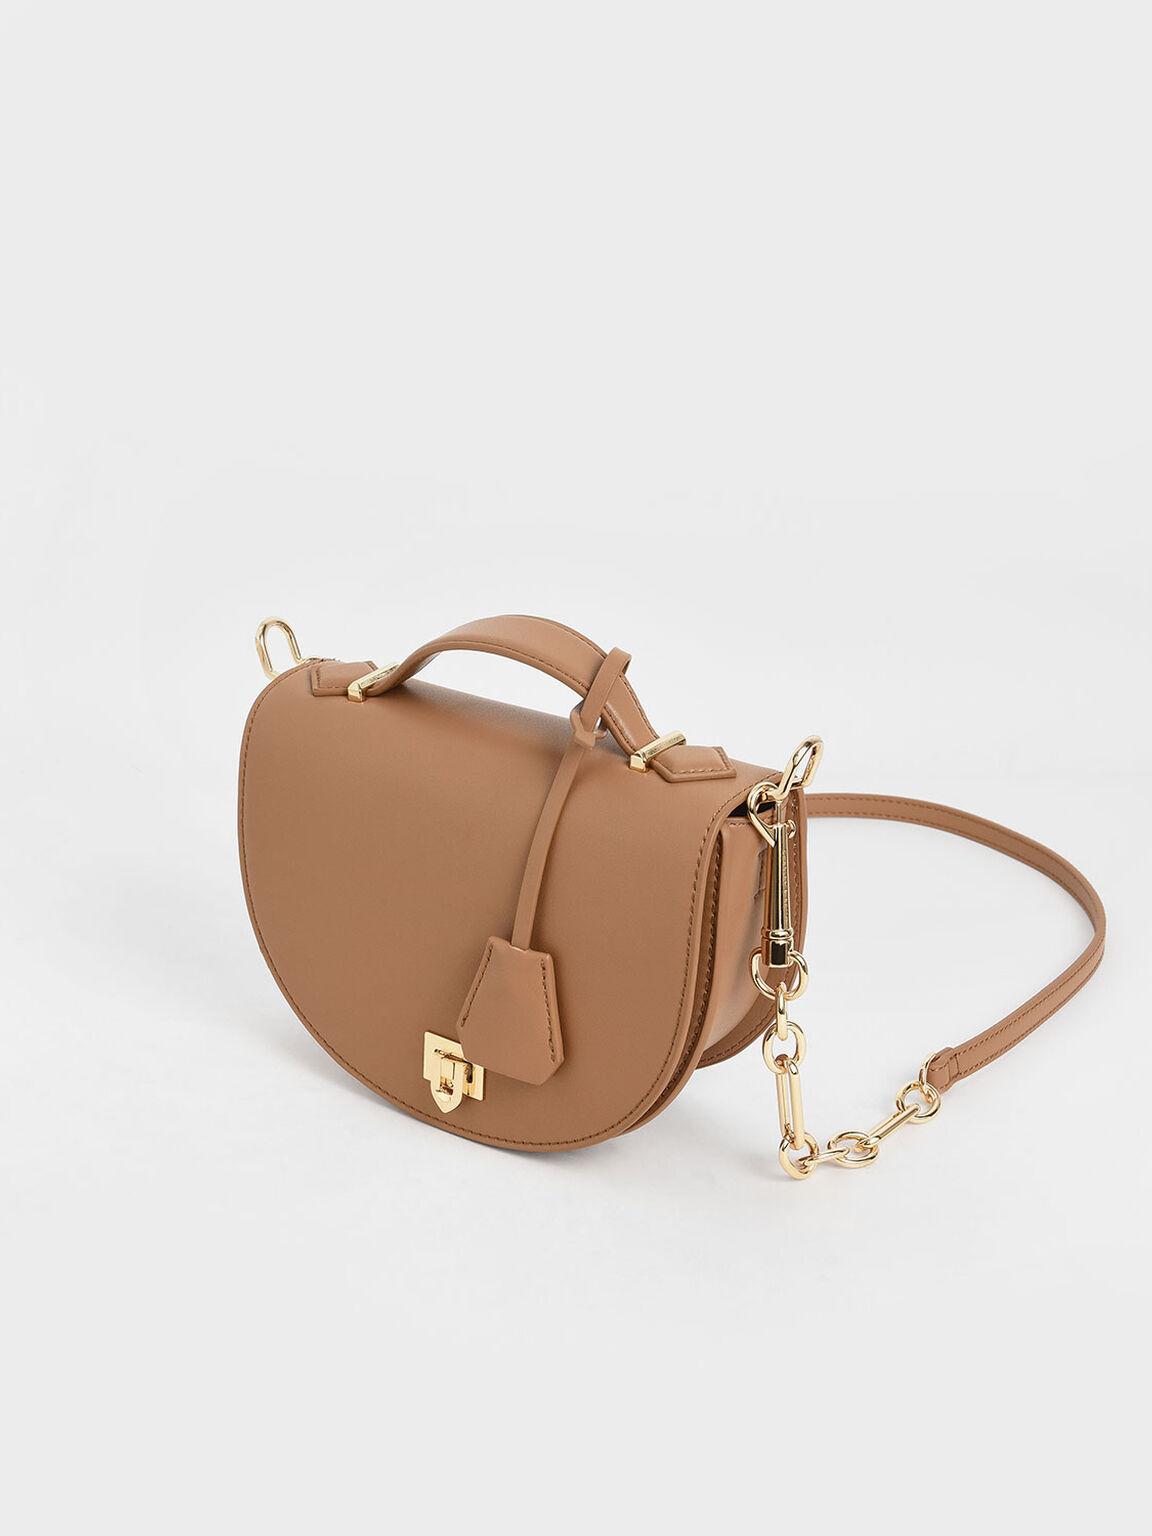 Top Handle Saddle Bag, Nude, hi-res